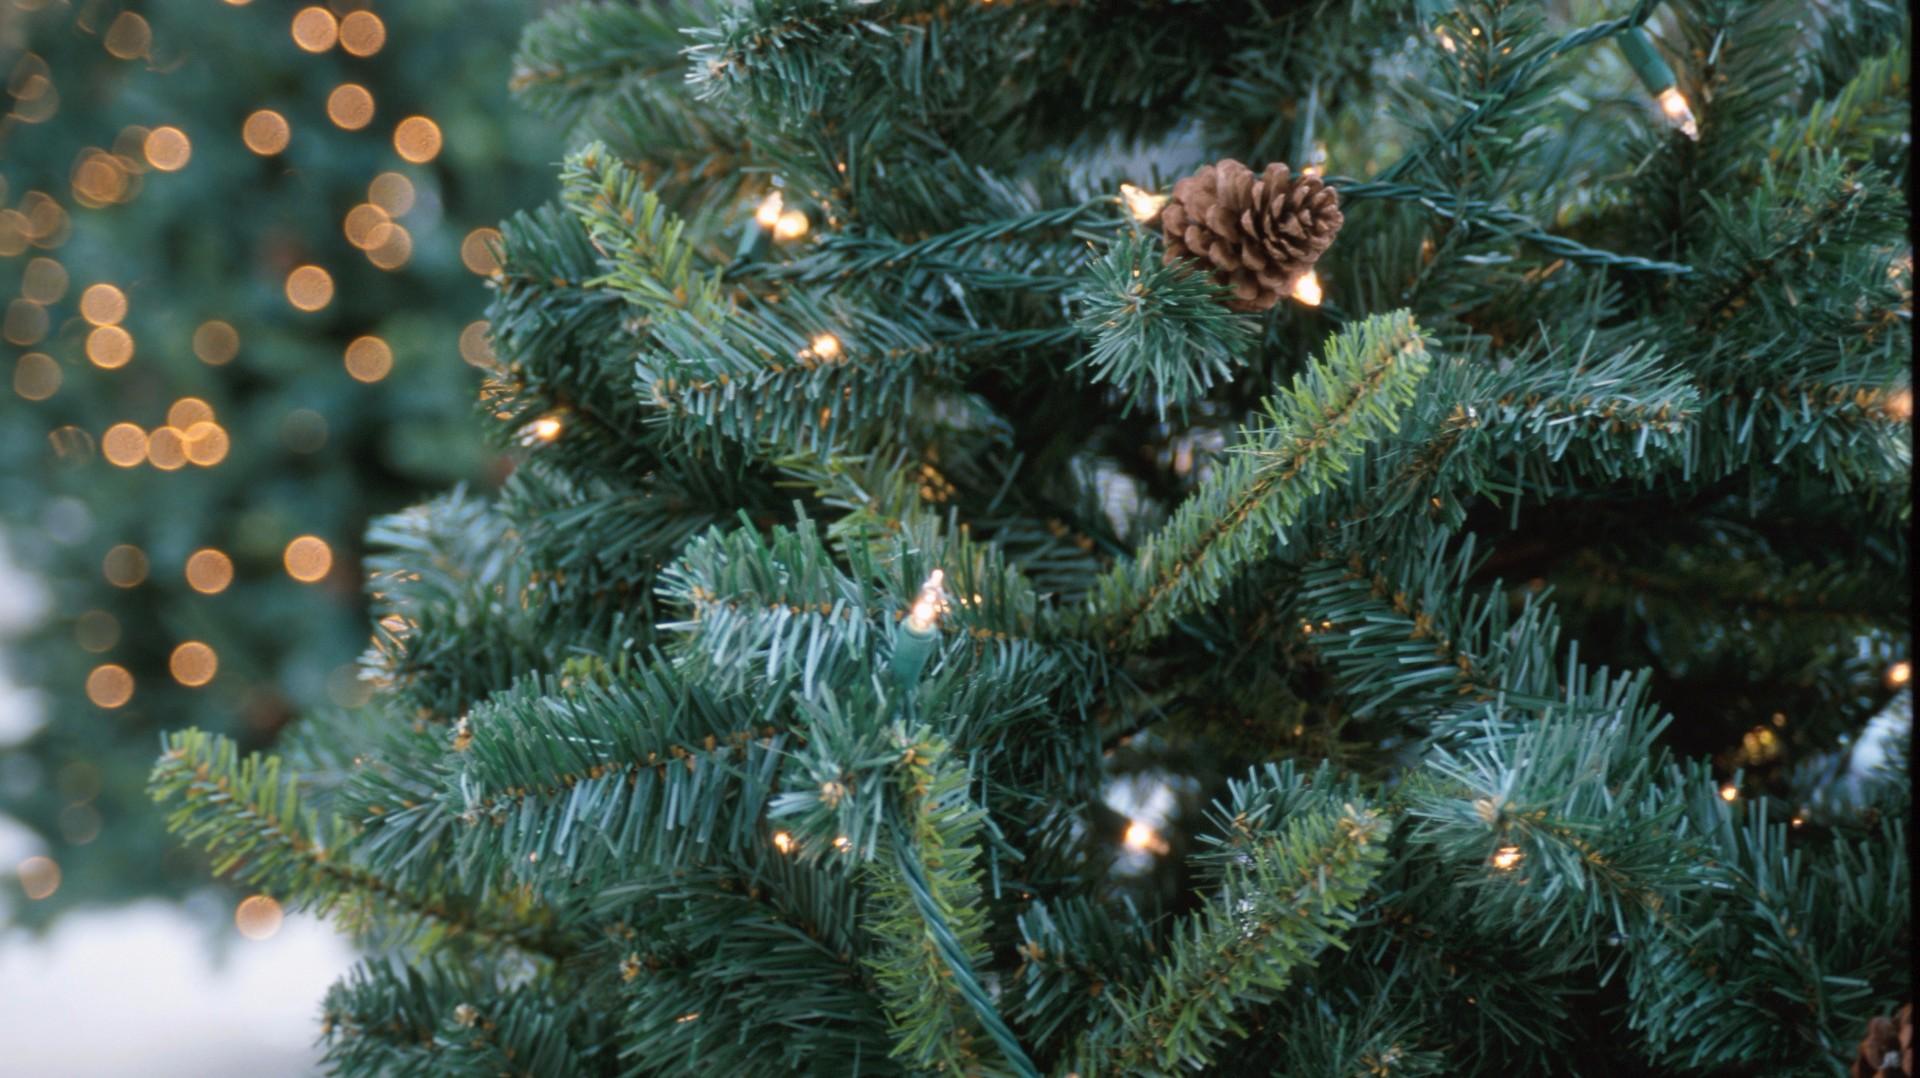 Prescott National Forest Christmas Tree Permits 2021 Thousands Buy Permits In Arizona To Cut Down Christmas Trees 12news Com